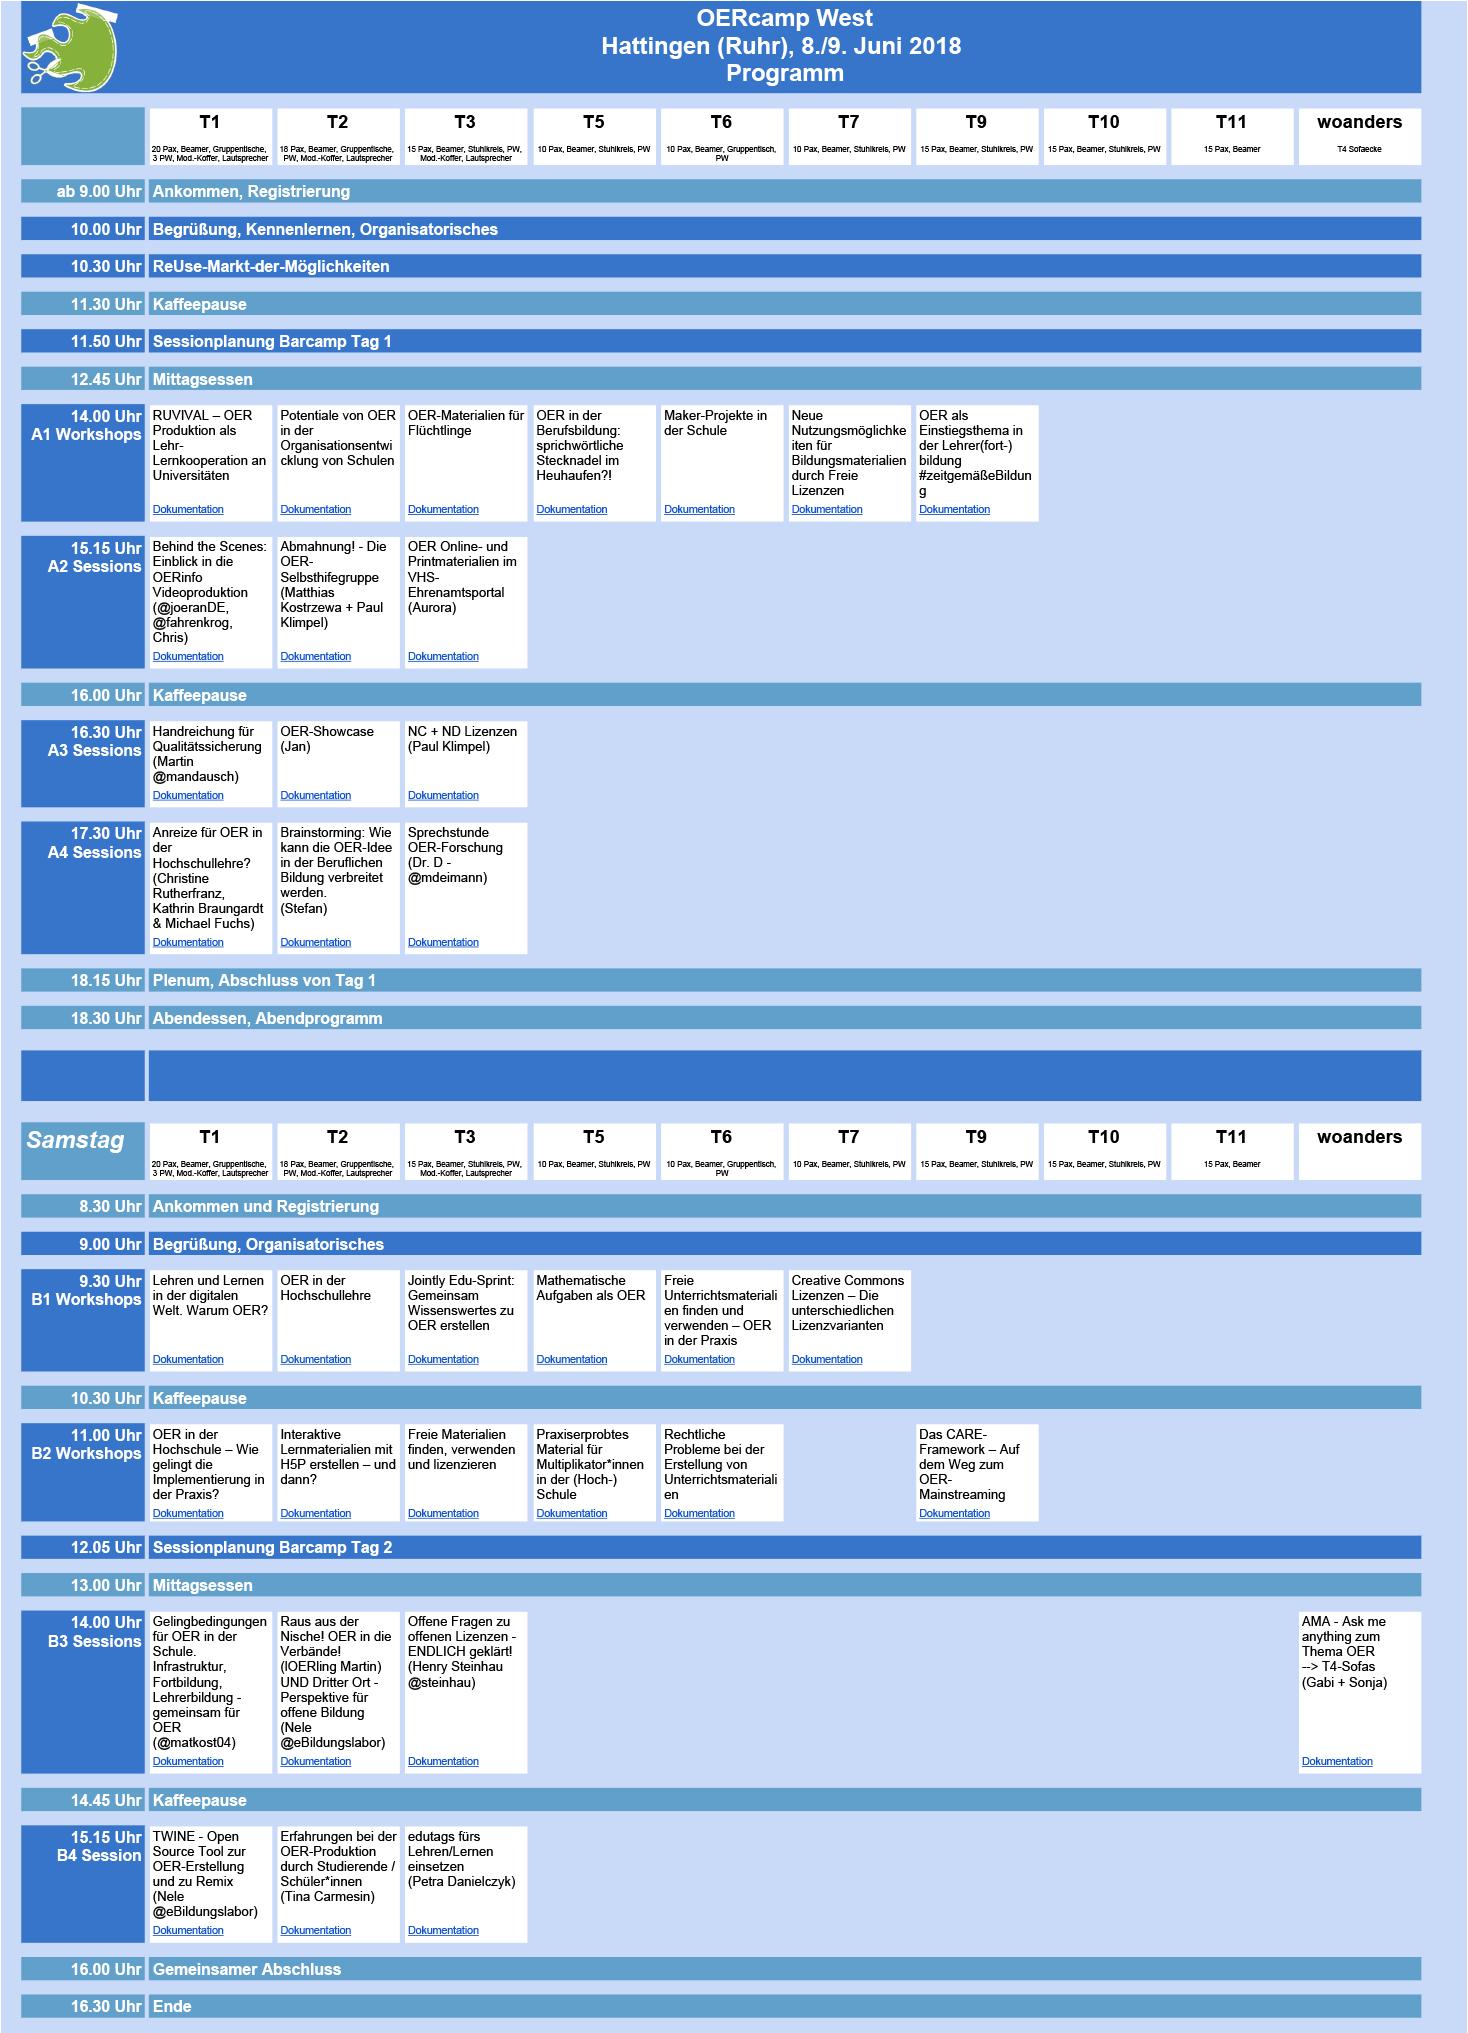 Vorschau (Screenshot) zum Plan in Google Docs